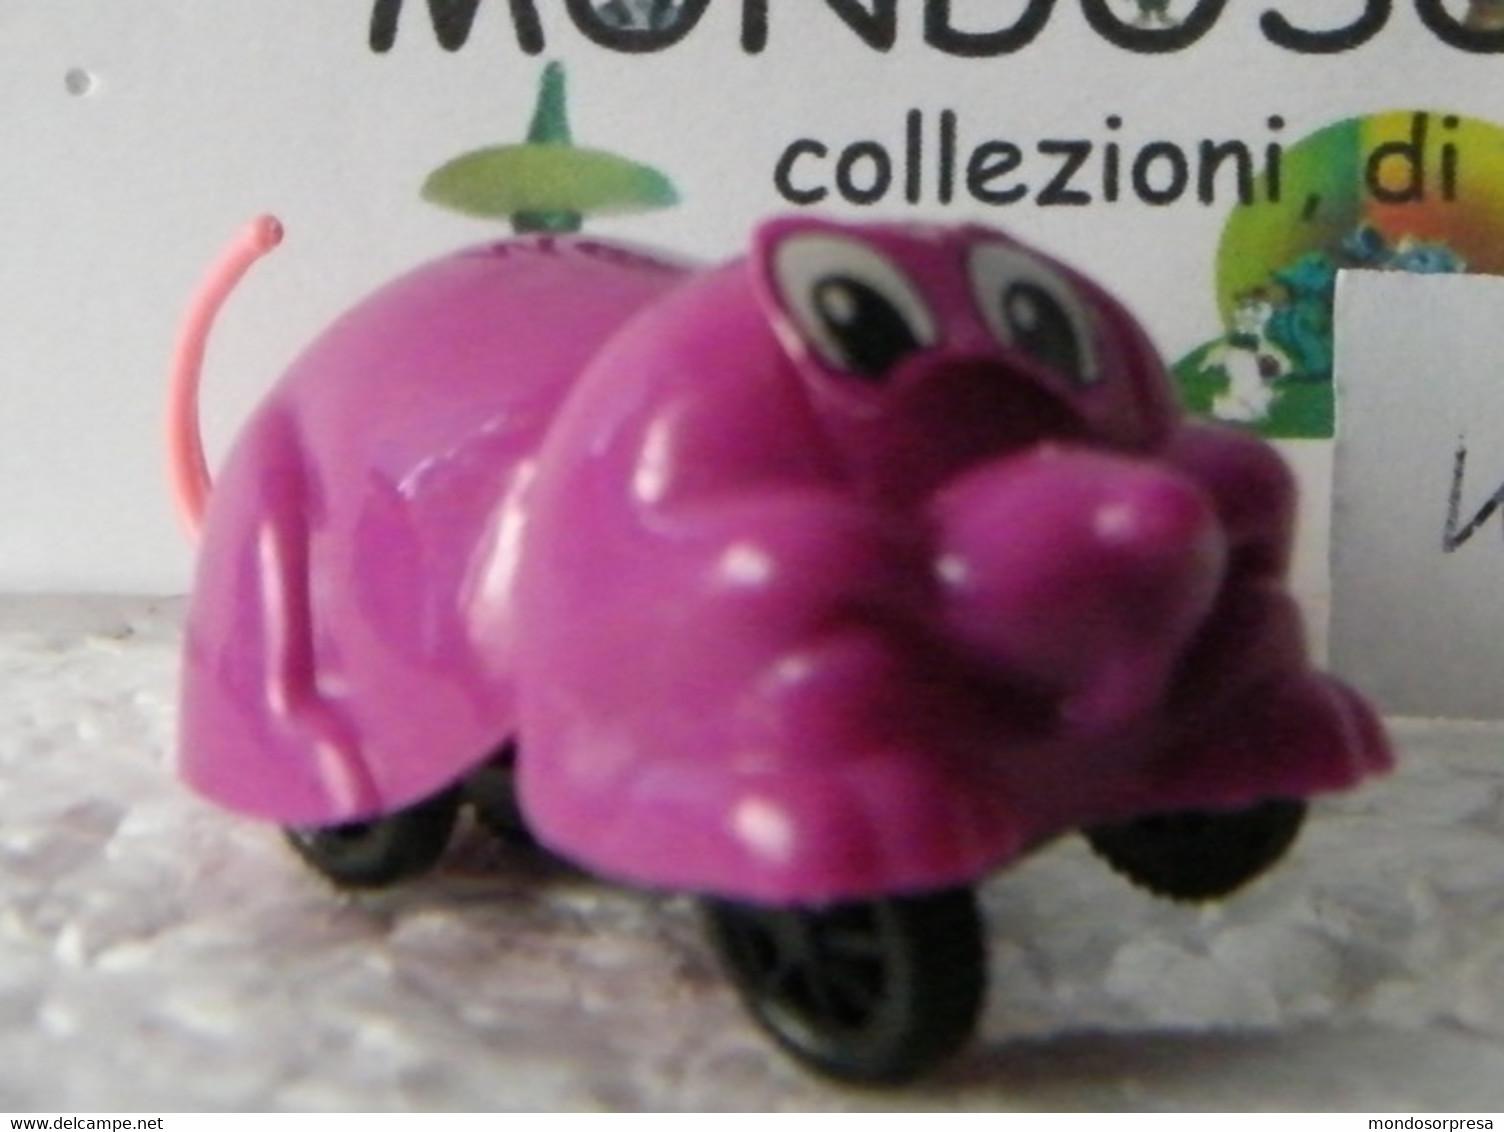 MONDOSORPRESA, (SC95-24) FERRERO, TOPOLINO AUTOMOBILE, PER RECUPERO PEZZI, MANCA ORECCHIE  K95 N81 - Mountables